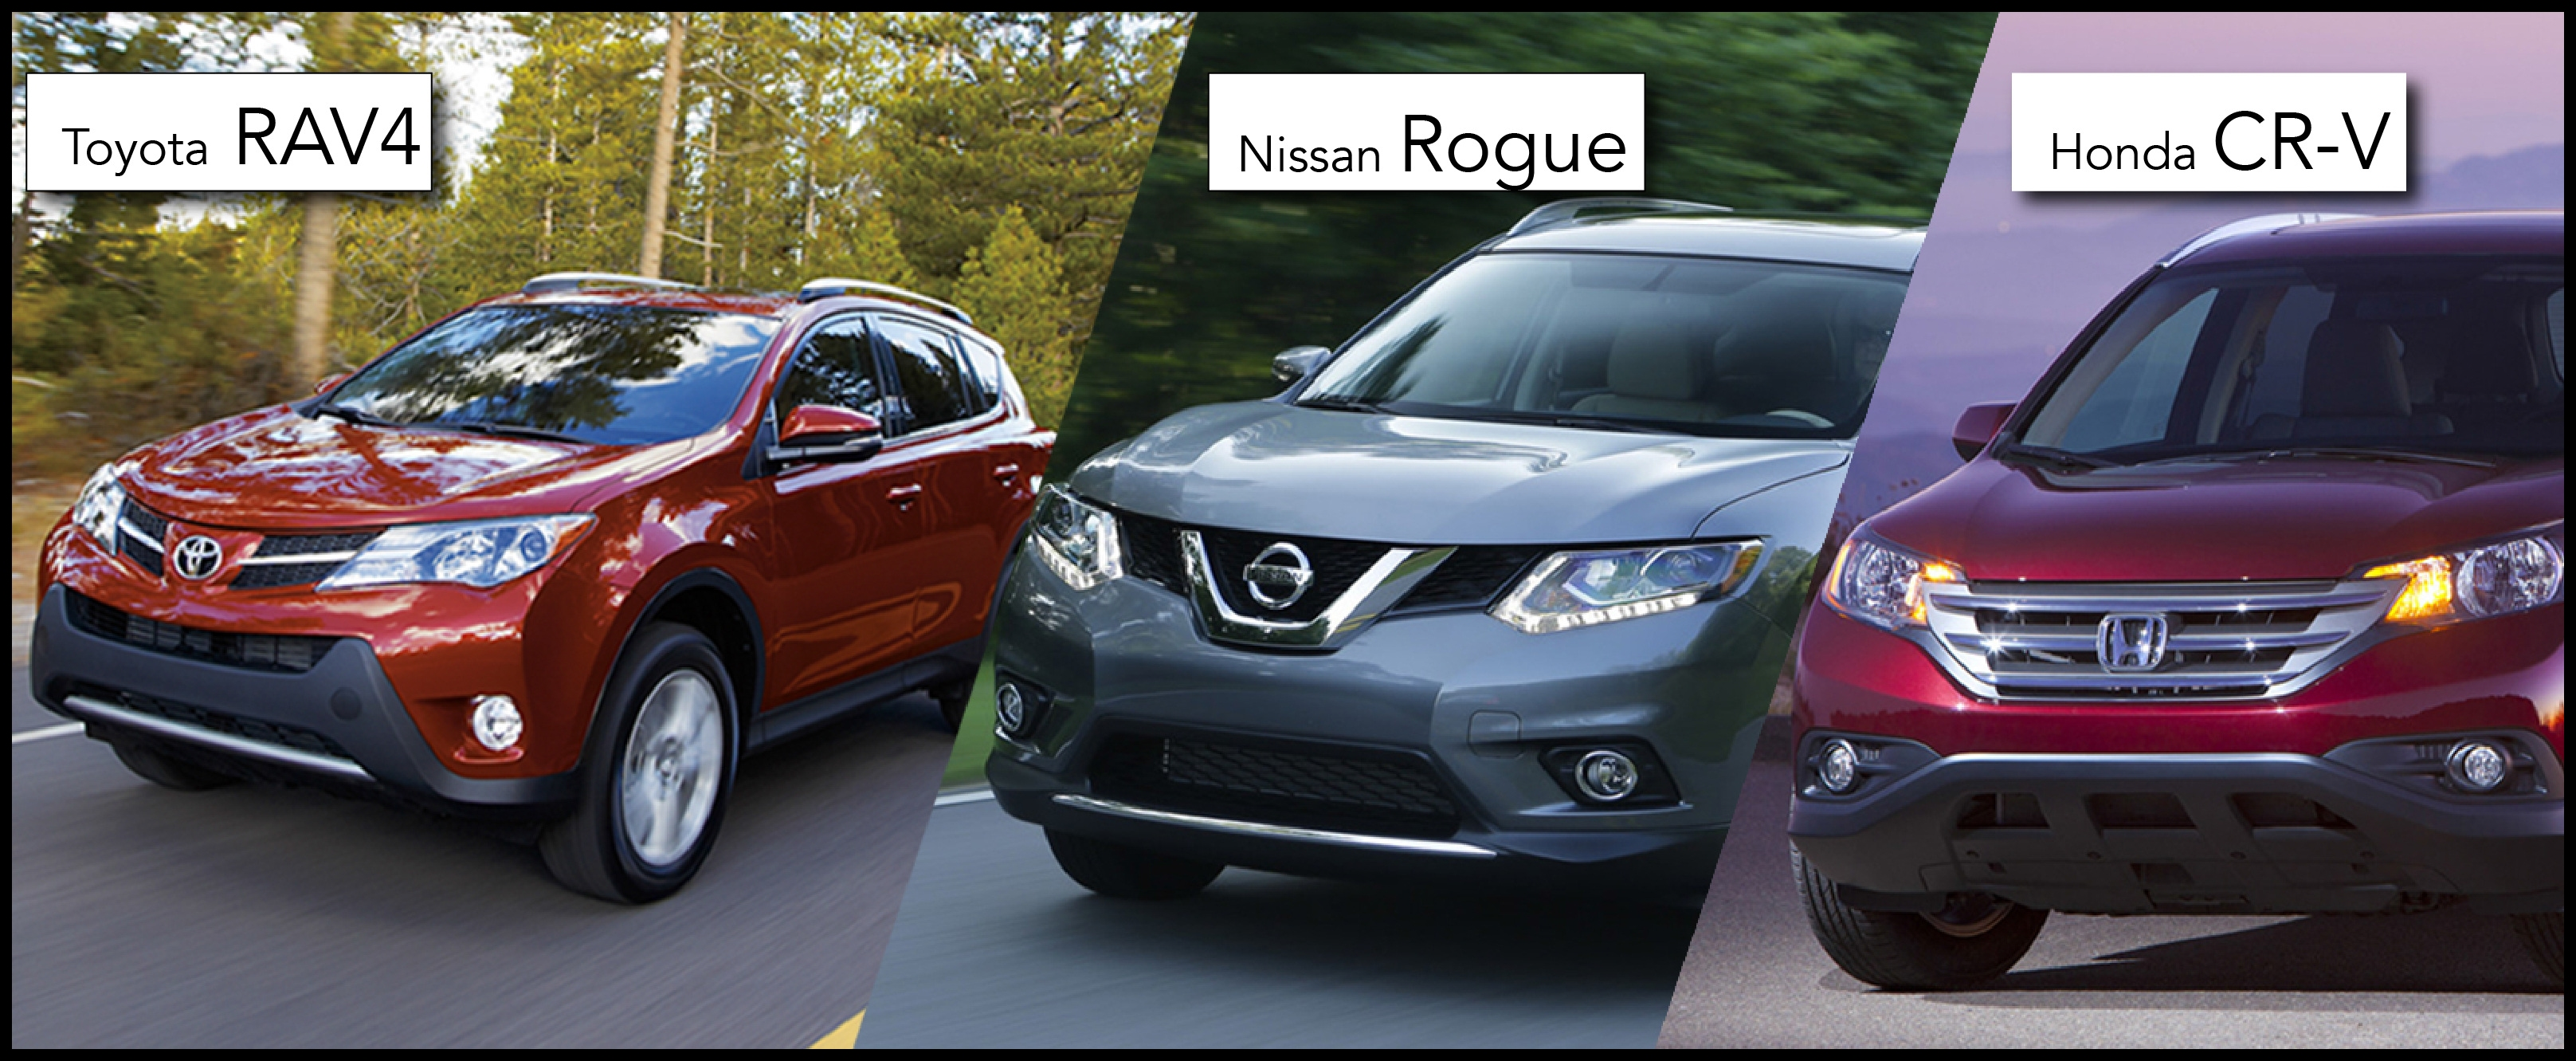 Top Honda Crv Vs Nissan Rogue the toyota Rav4 Vs the Honda Cr V and the